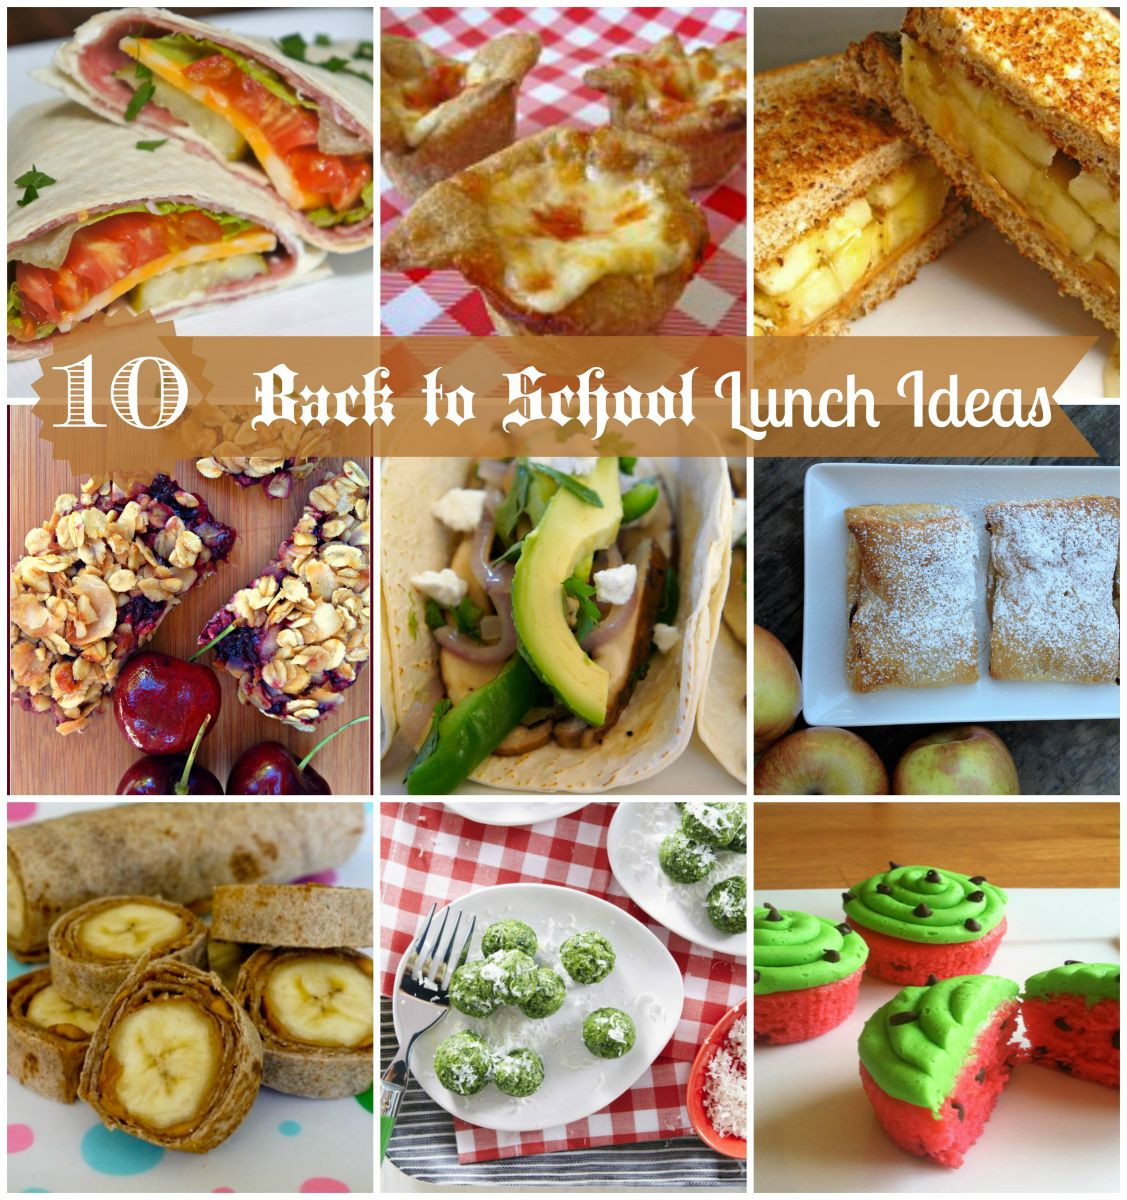 Back To School Lunch Ideas  10 Back To School Lunch Ideas by Somedutta Sengupta